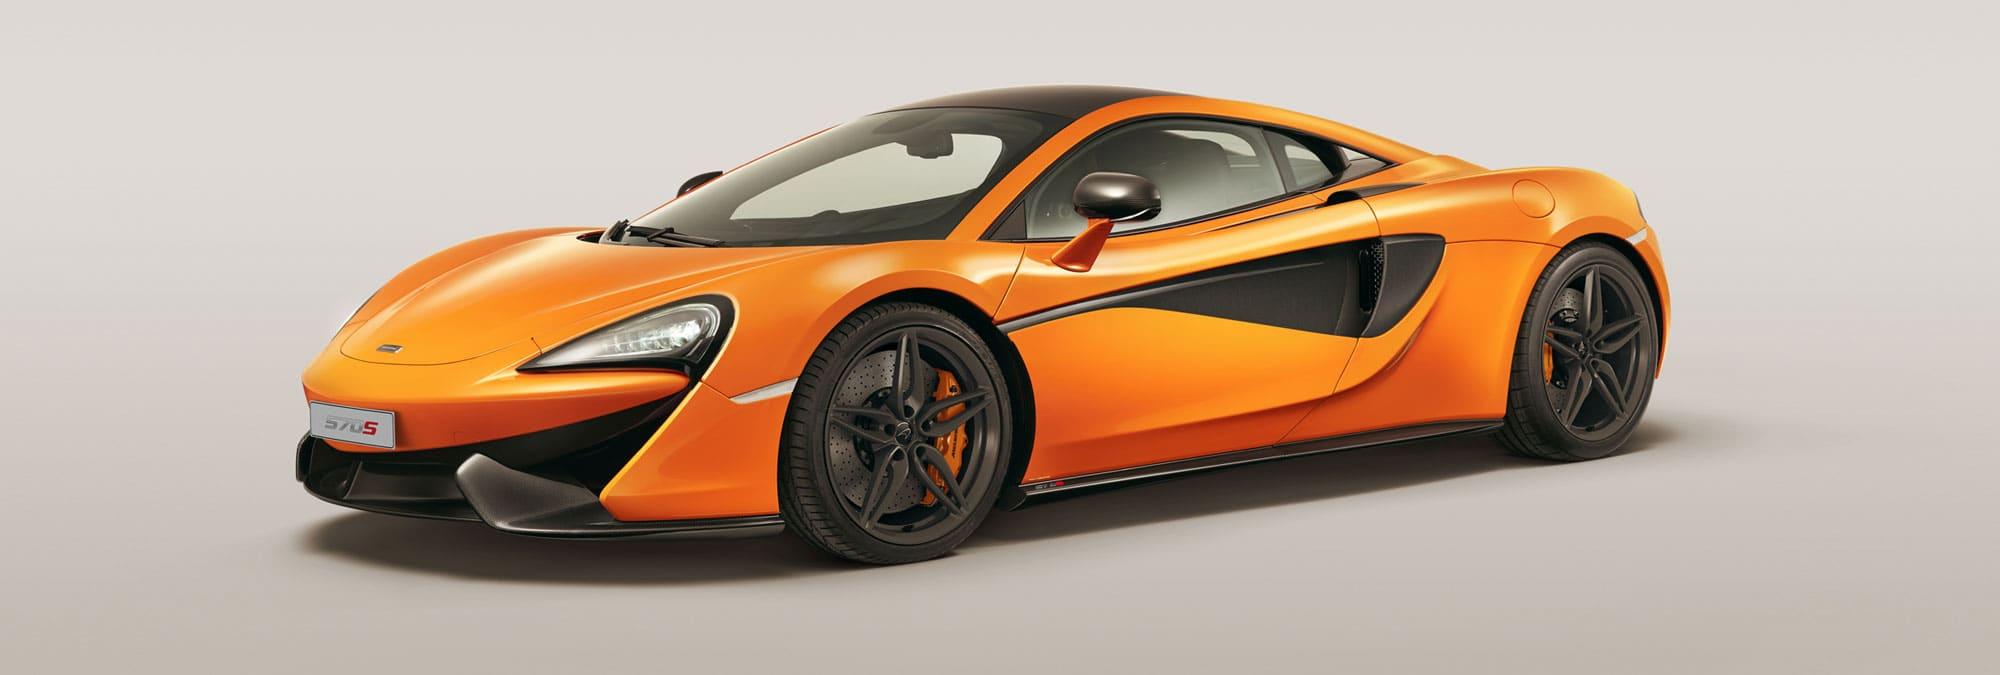 mclaren-570s-orange-tampa-side-3qtr-hero-dimmitt